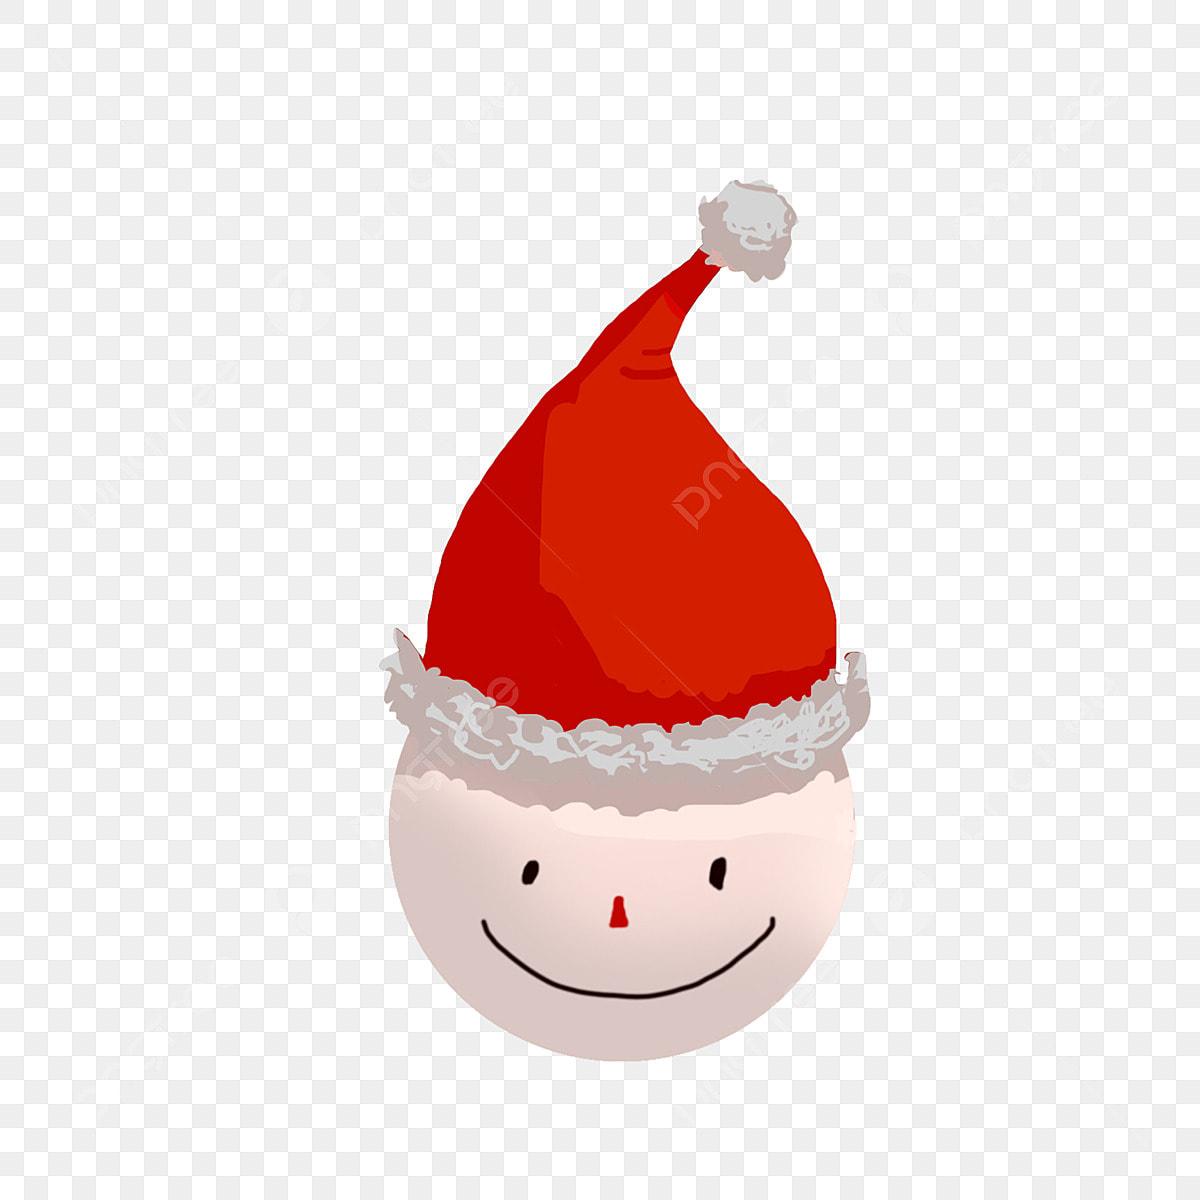 Christmas Hat Cartoon Transparent.Red Christmas Hat Cartoon Expression Cartoon Snowman Head